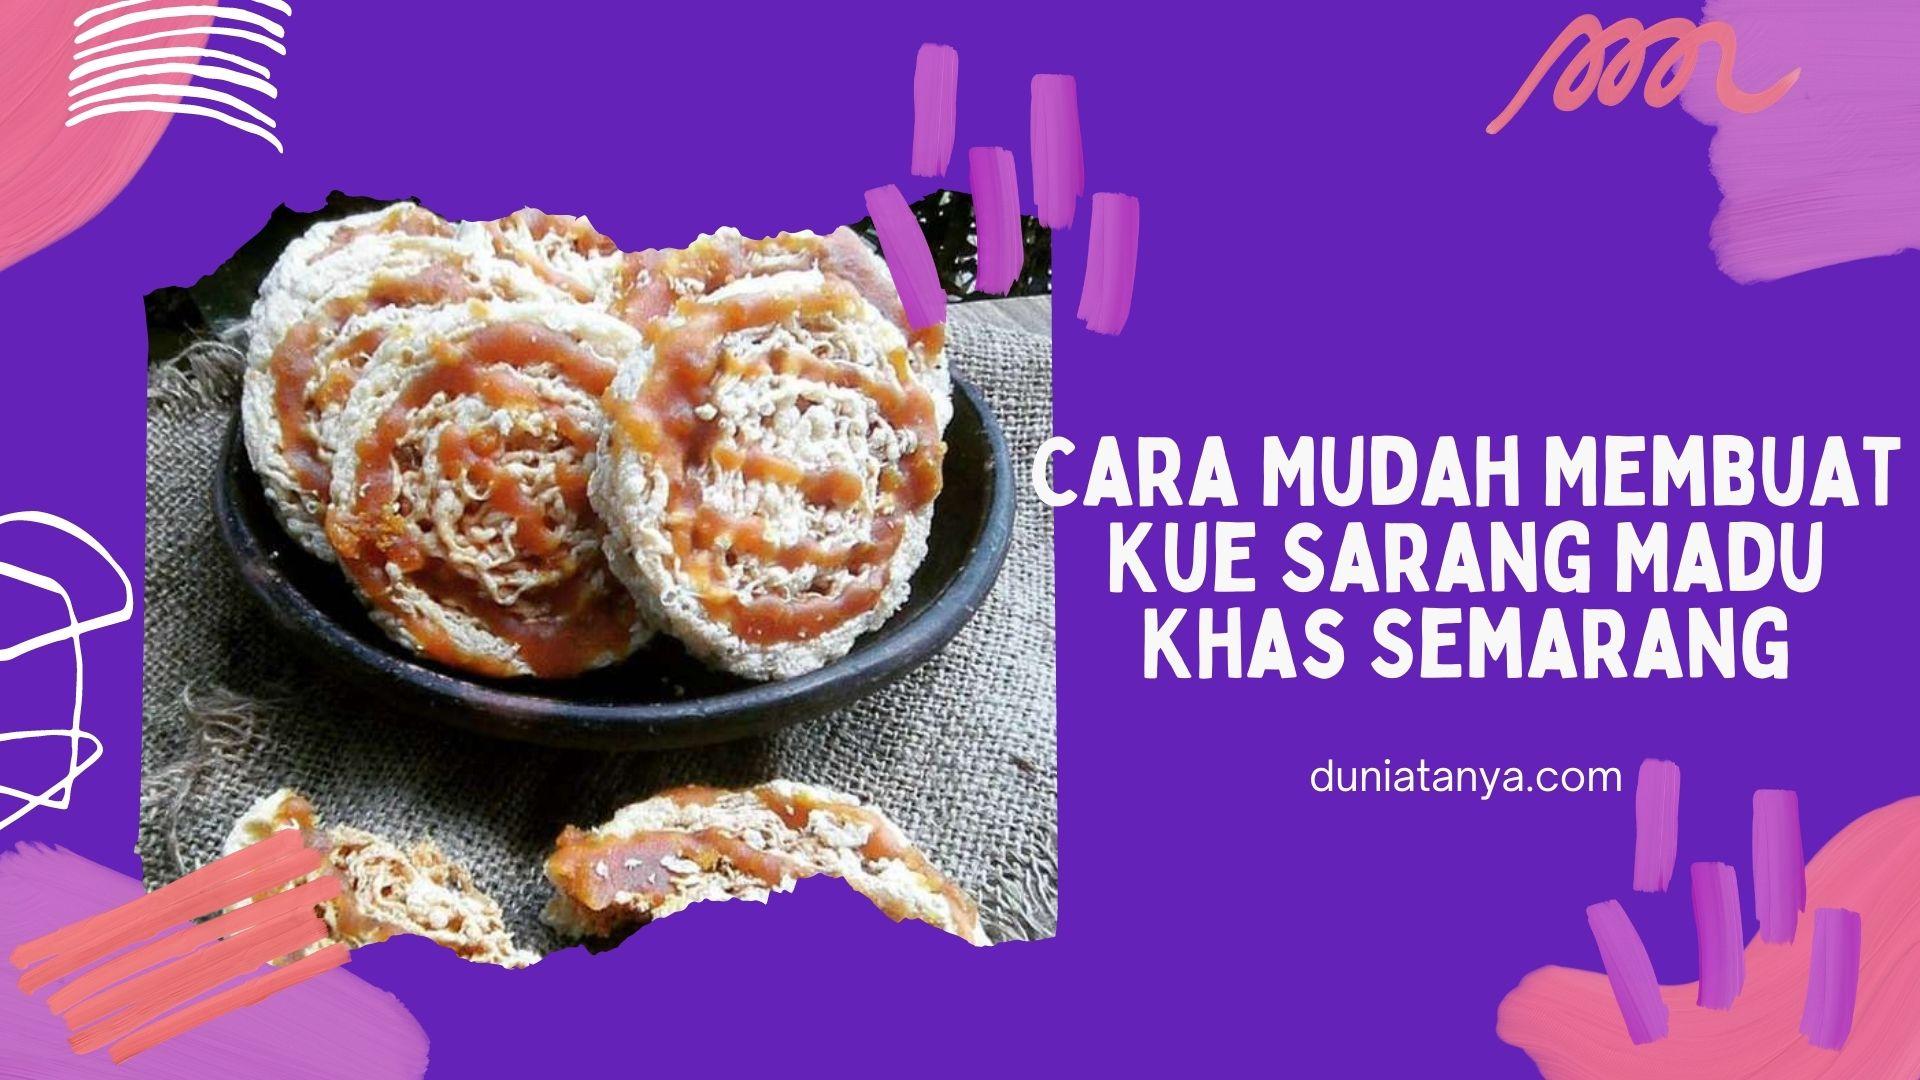 You are currently viewing Cara Mudah Membuat Kue Sarang Madu Khas Semarang